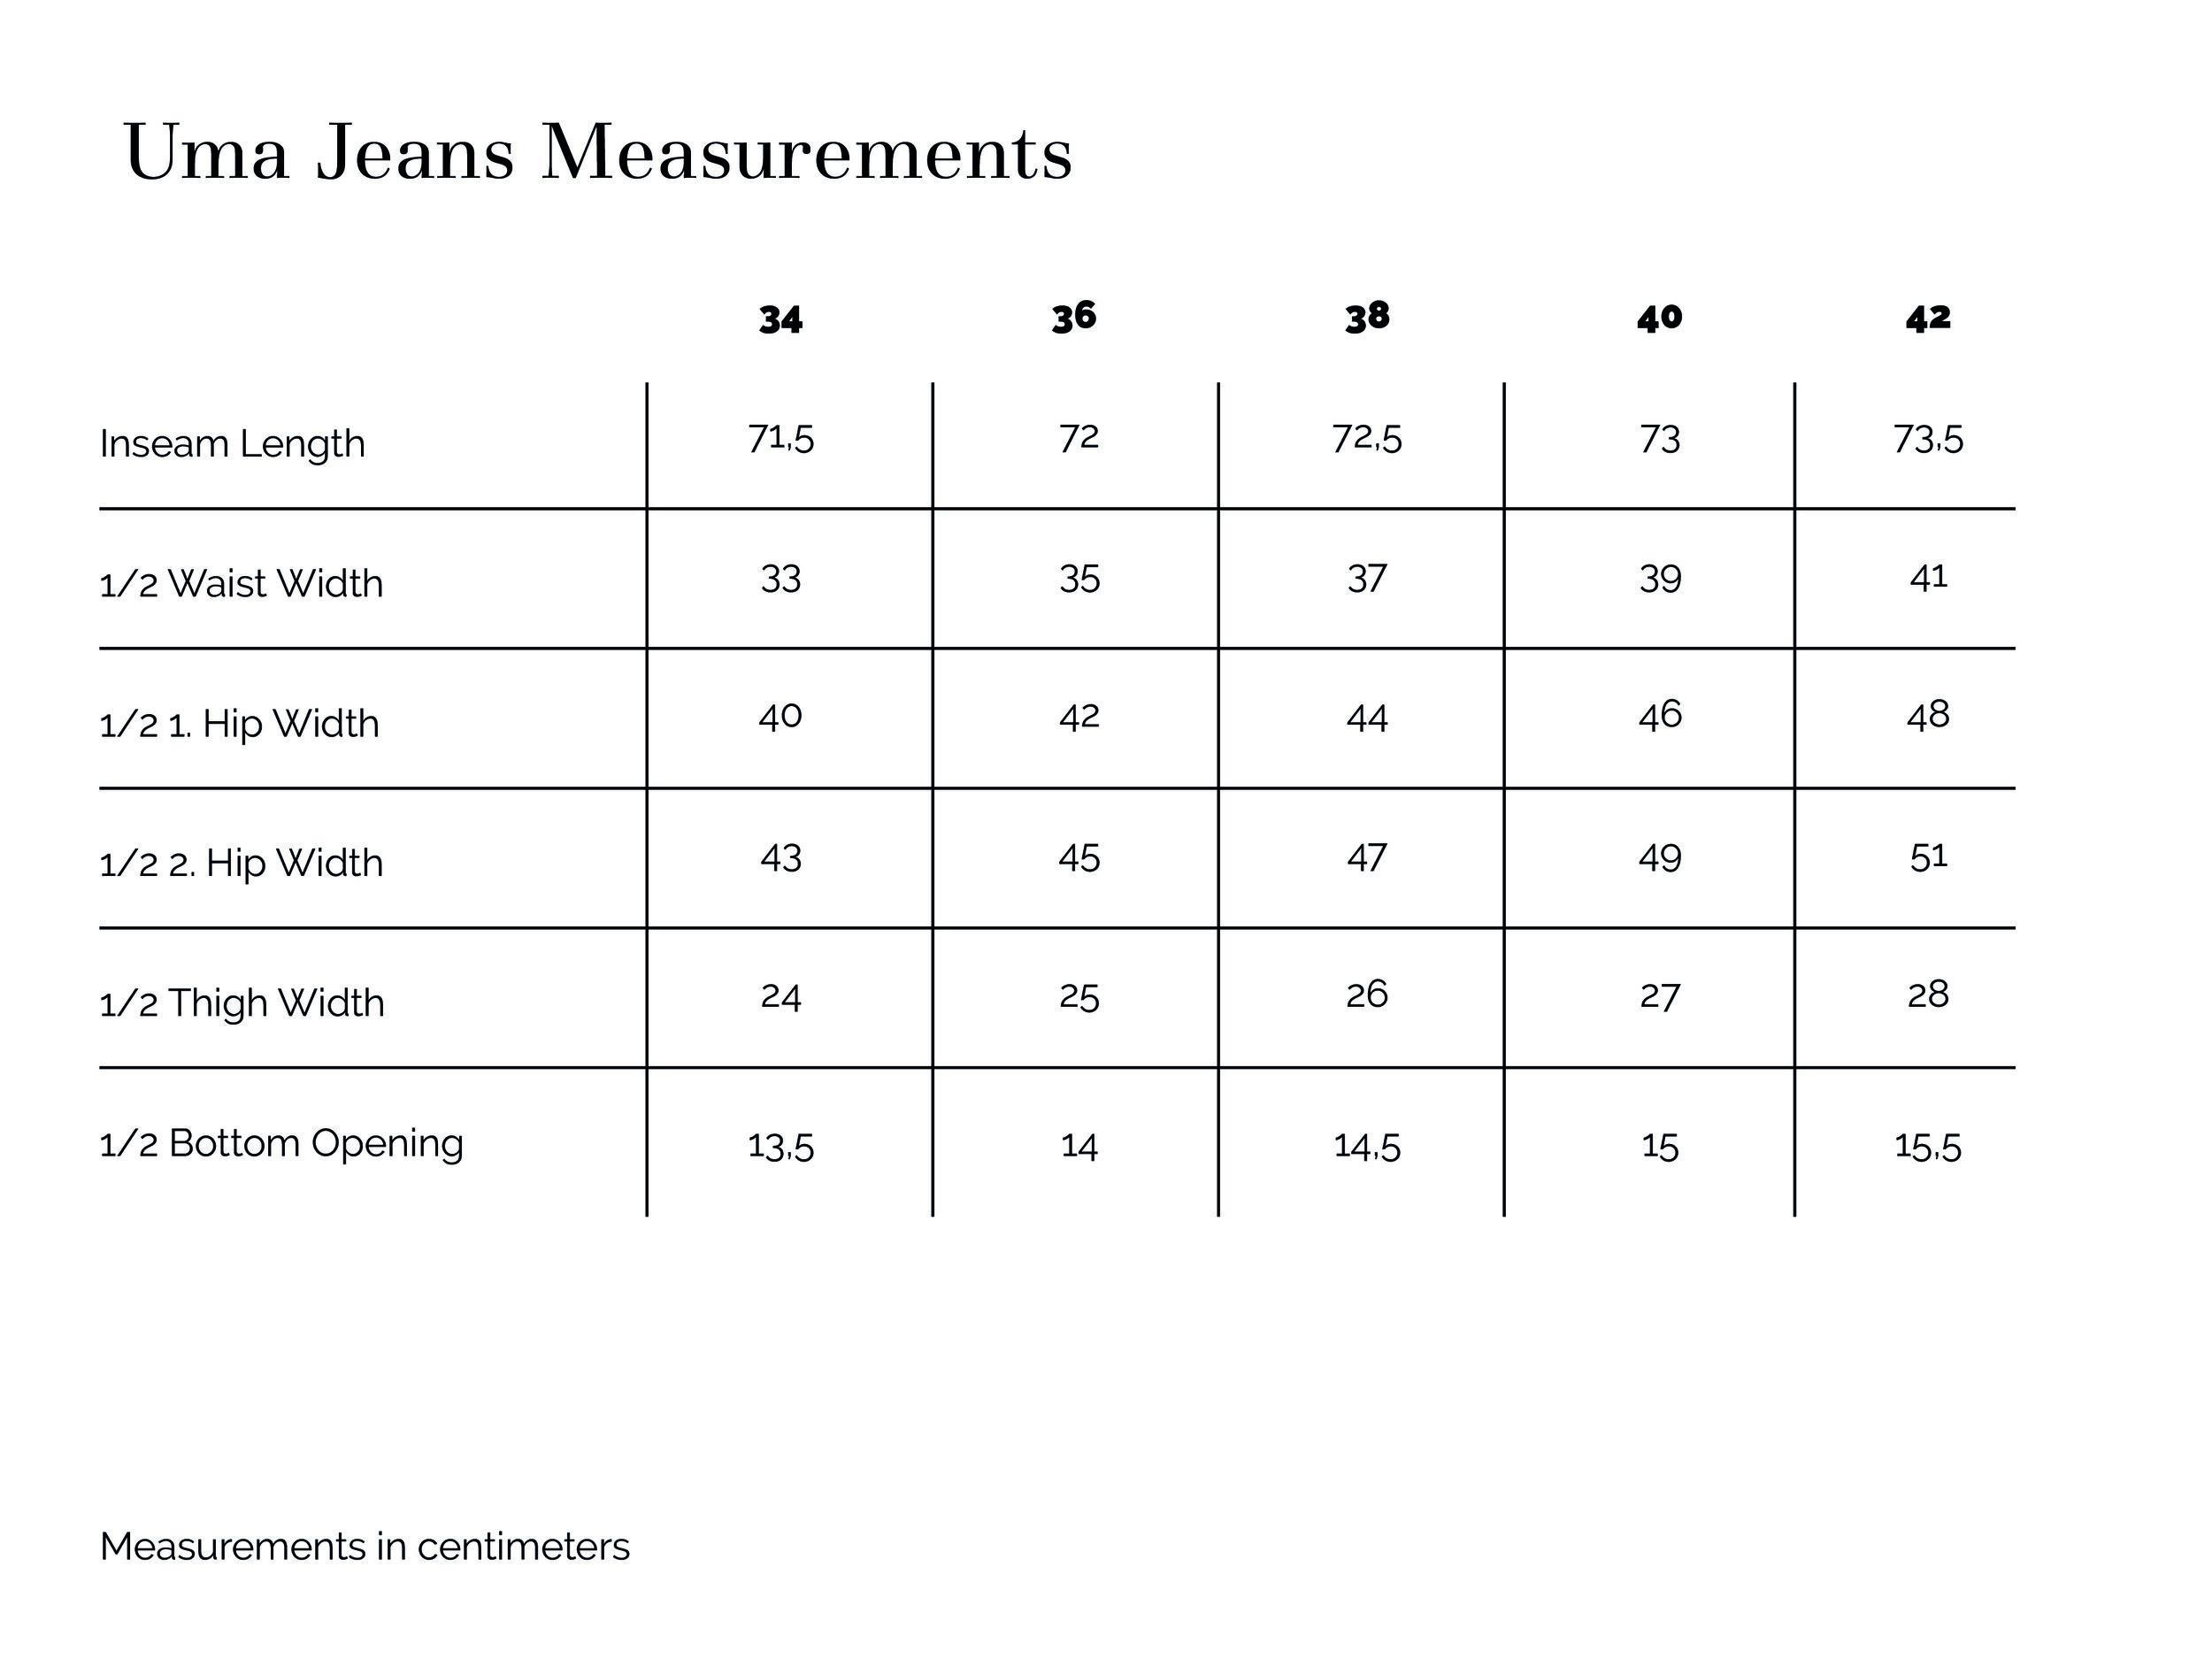 Uma Jeans Measurements.jpg